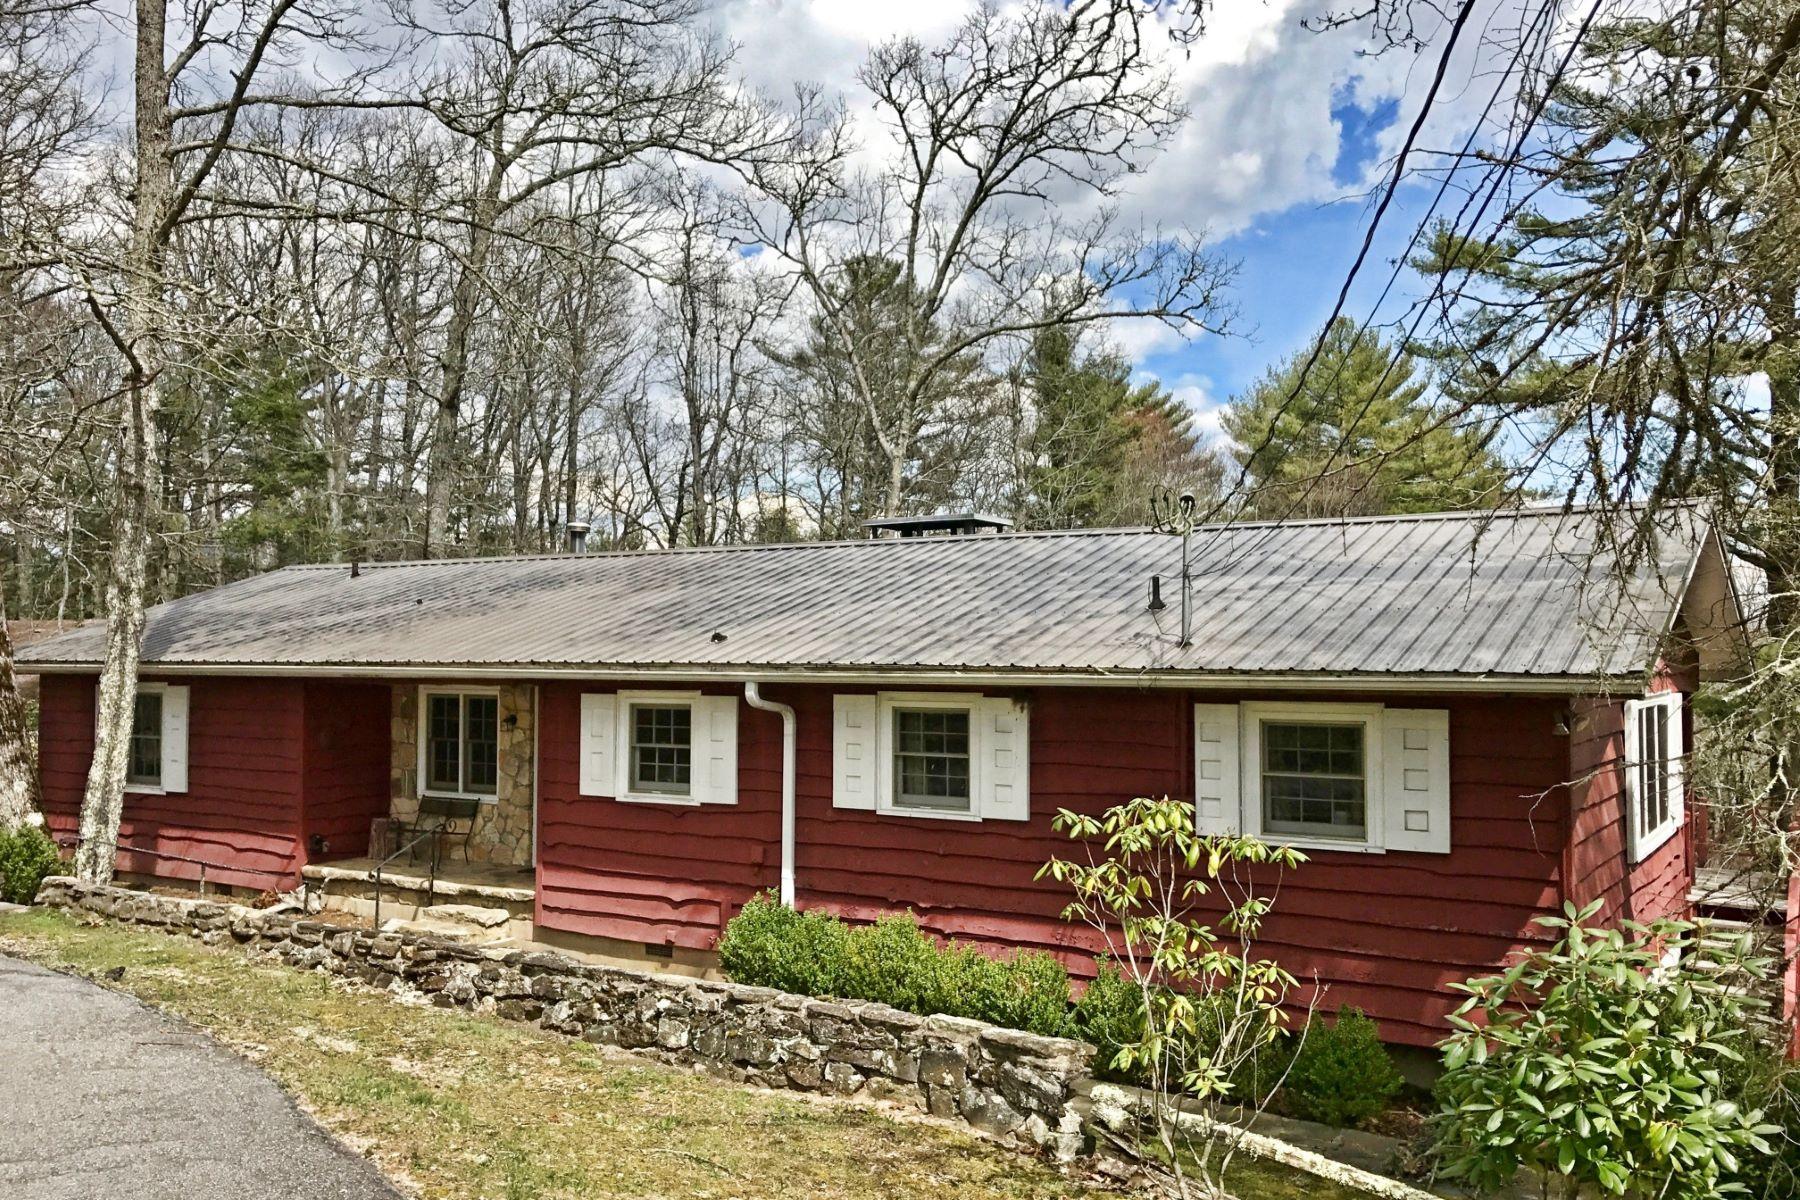 Single Family Home for Sale at 132 Strawberry Lane Highlands, North Carolina, 28741 United States